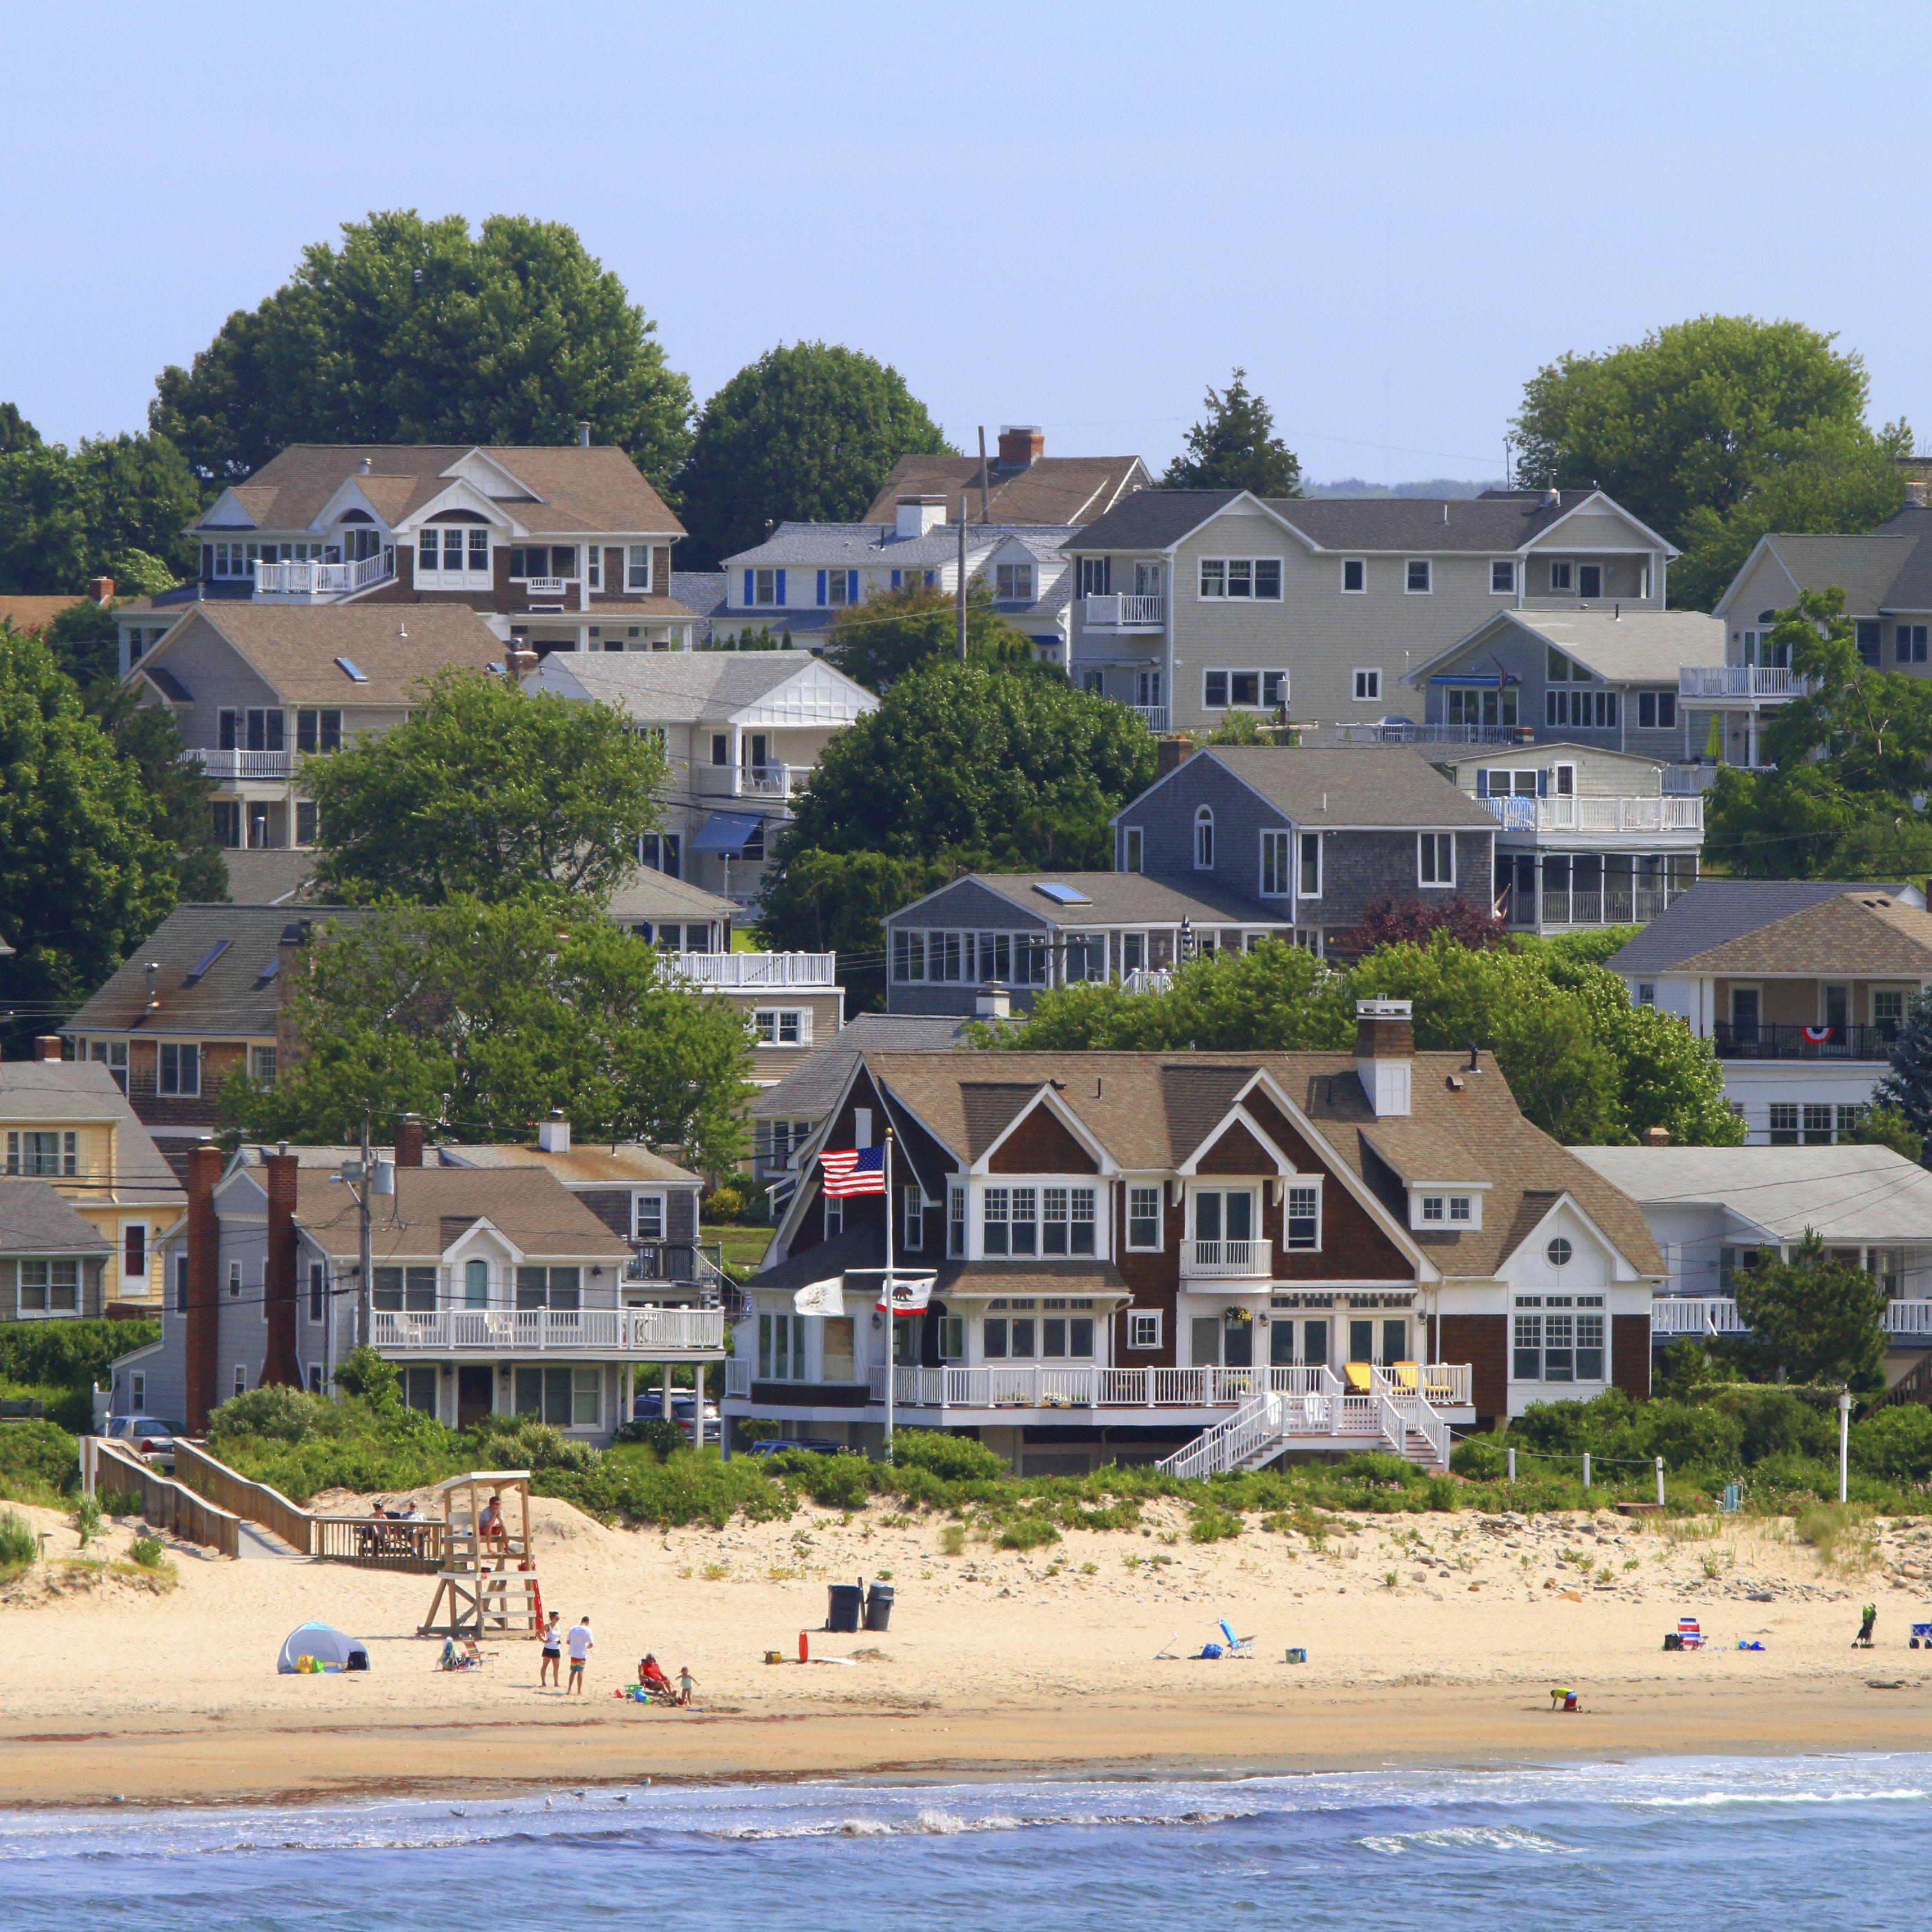 Fine Durkin Cottage Realty In Narragansett Rhode Island Home Interior And Landscaping Ferensignezvosmurscom